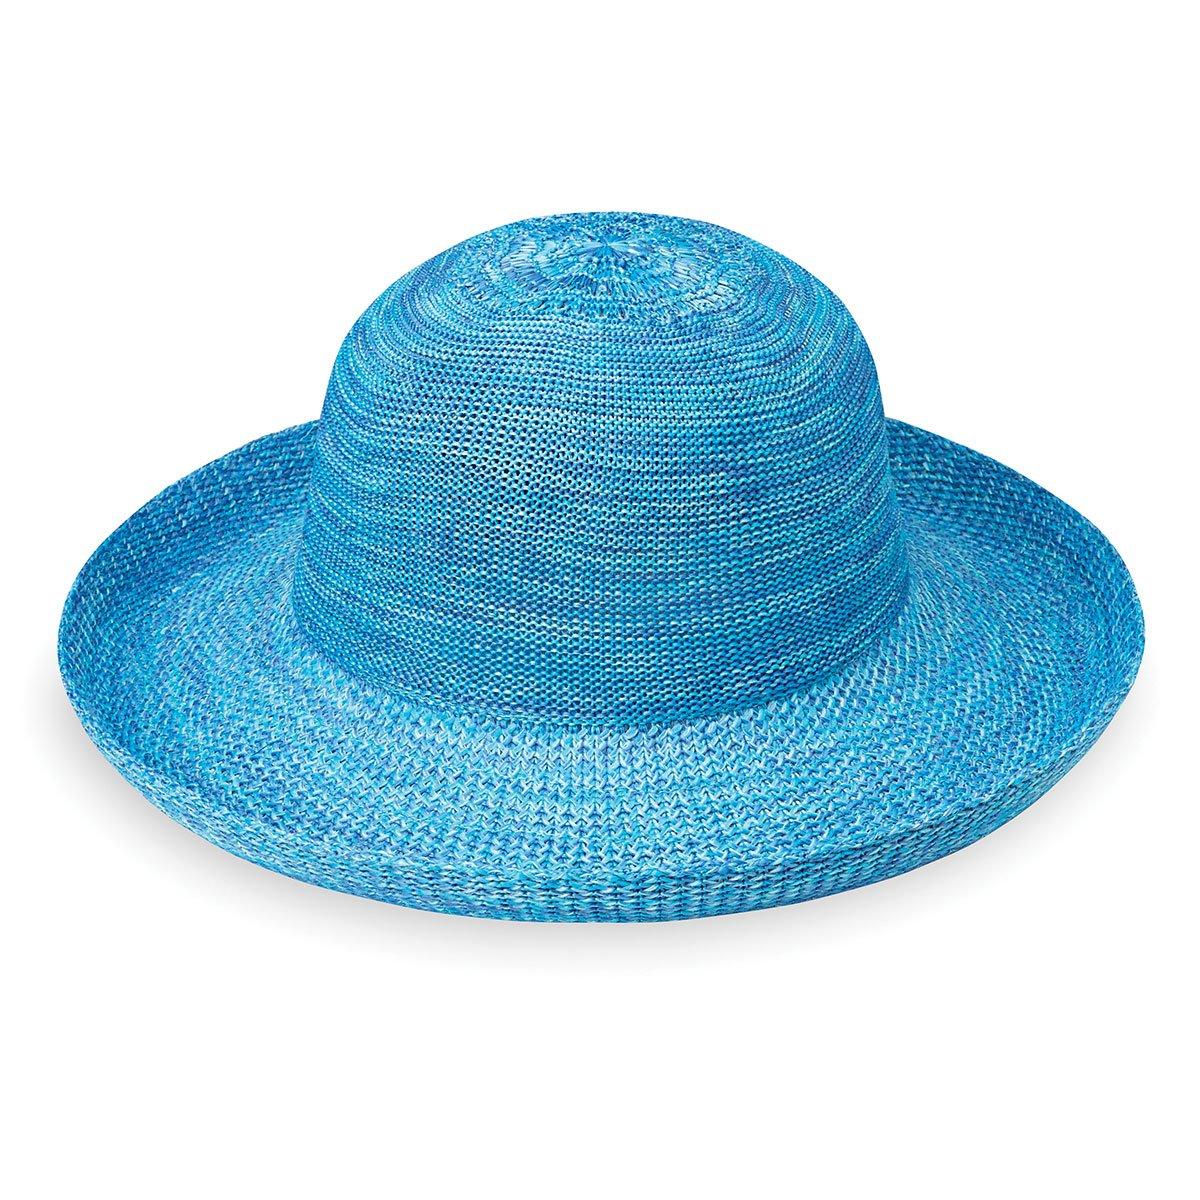 f77effd5 Wallaroo Hat Company Women's Victoria Sun Hat – Mixed Aqua –  Ultra-Lightweight, Packable, Modern Style, Designed in Australia.